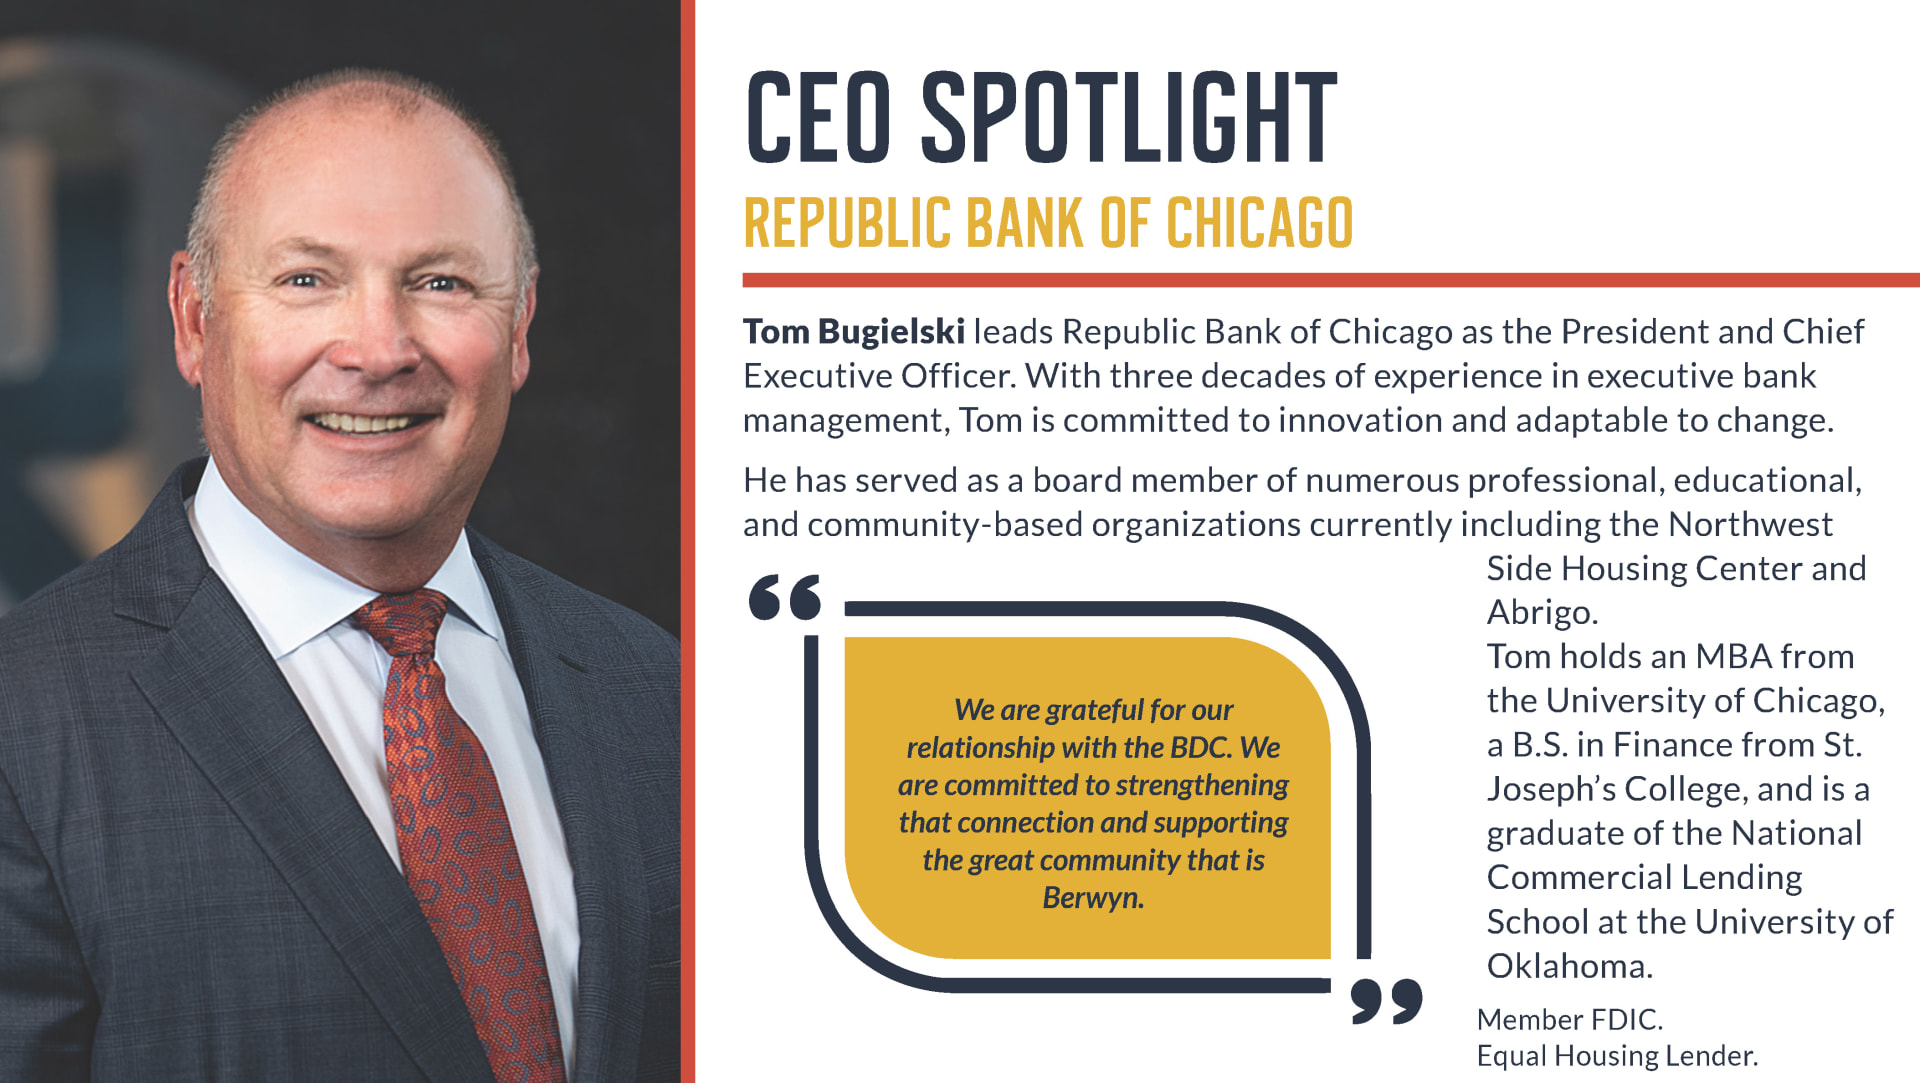 CEO-Spotlights-2020_Page_4-w1920.jpg